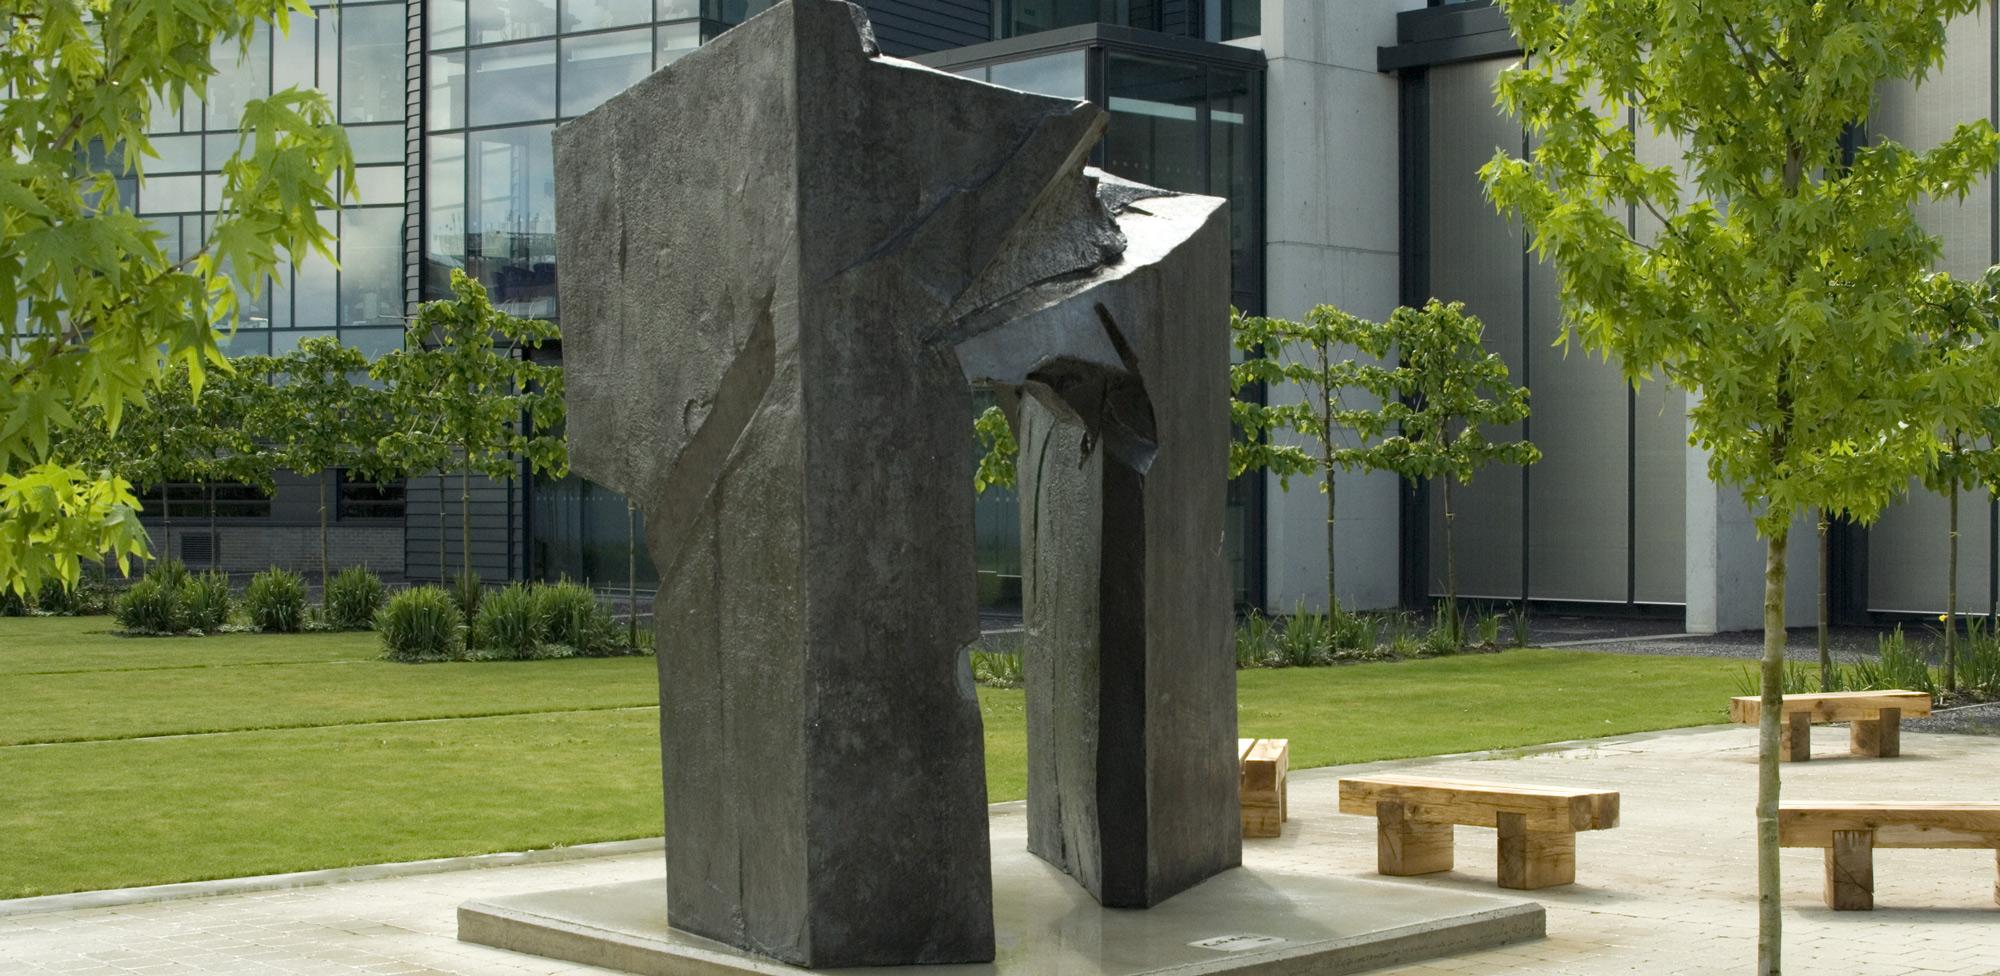 Taichi Arch - Gate of Health, sculpture outside of the CRUK Cambridge Institute